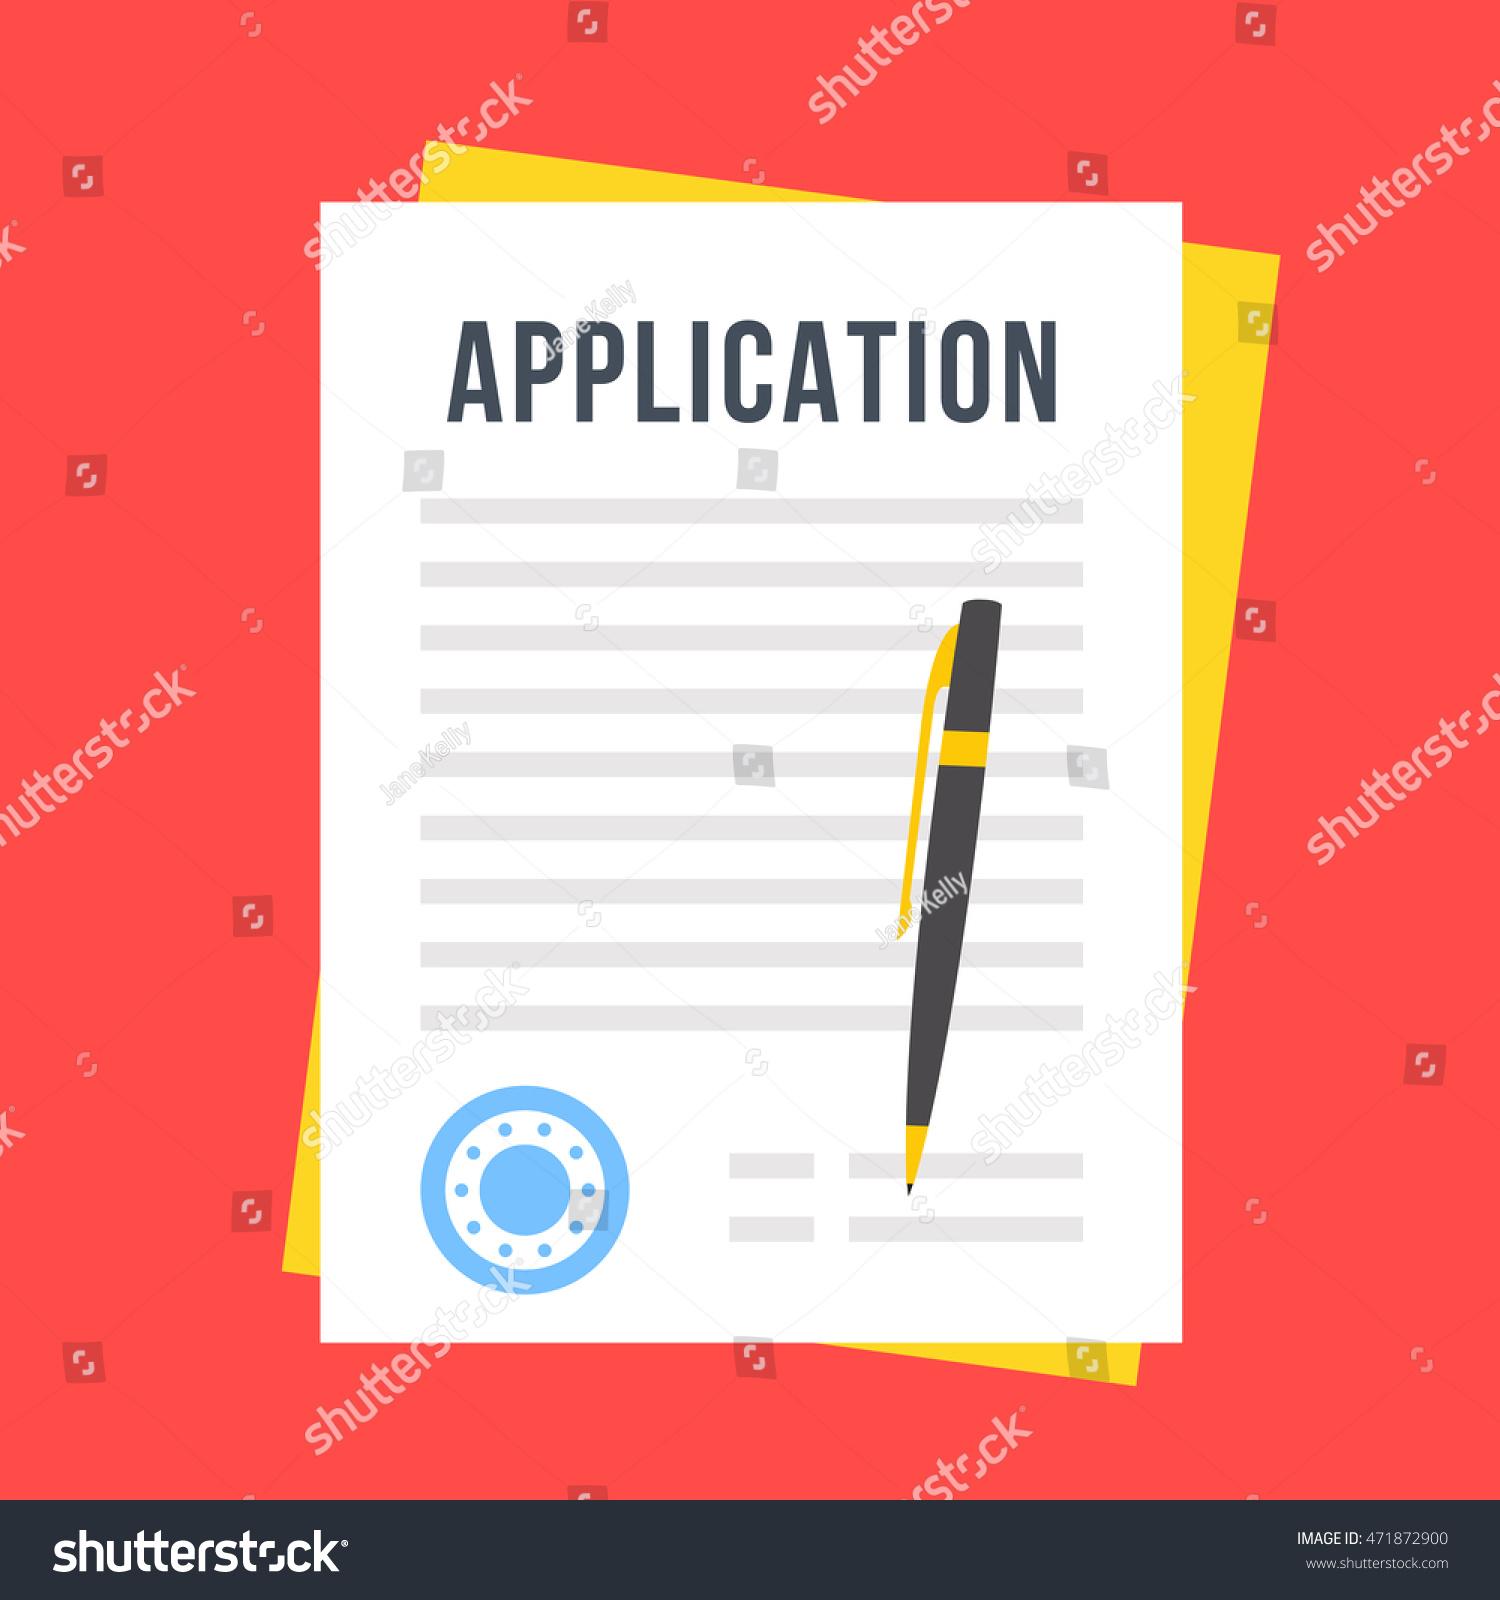 vector application form documents stamp pen のベクター画像素材